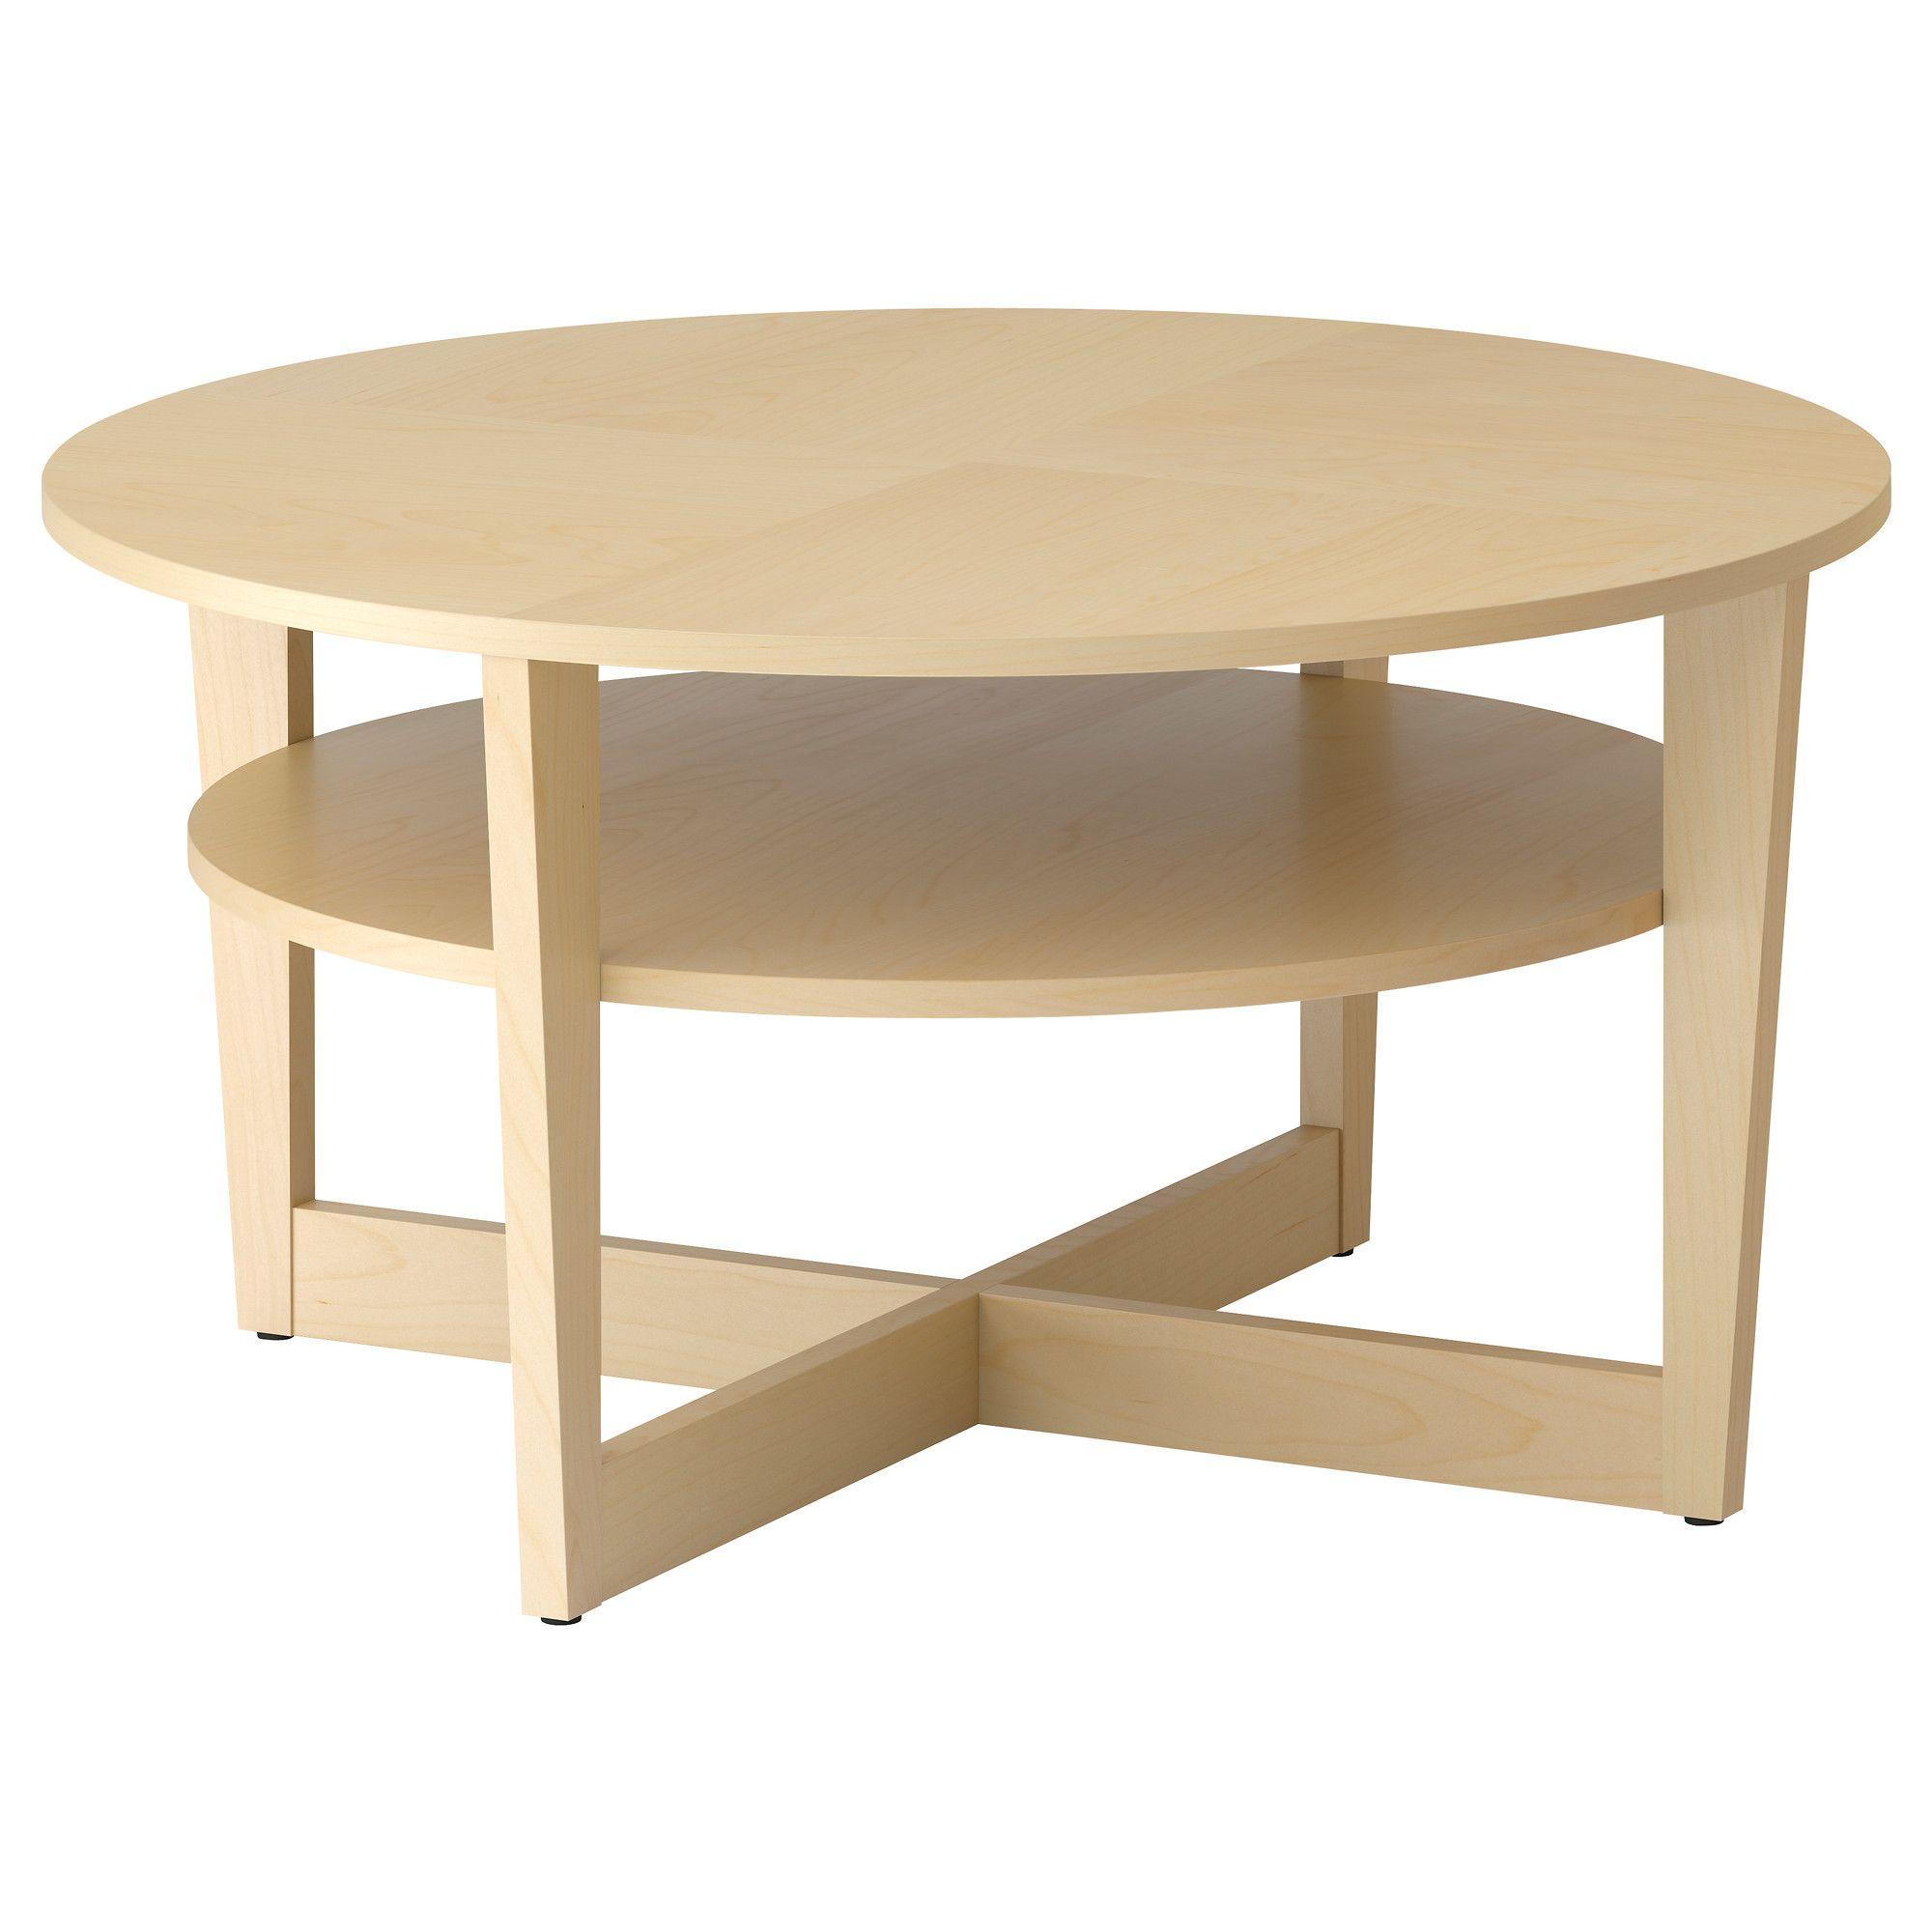 Home Furniture Store Modern Furnishings Decor Stol Kuhnya Stolovaya Stolovaya [ jpg ]